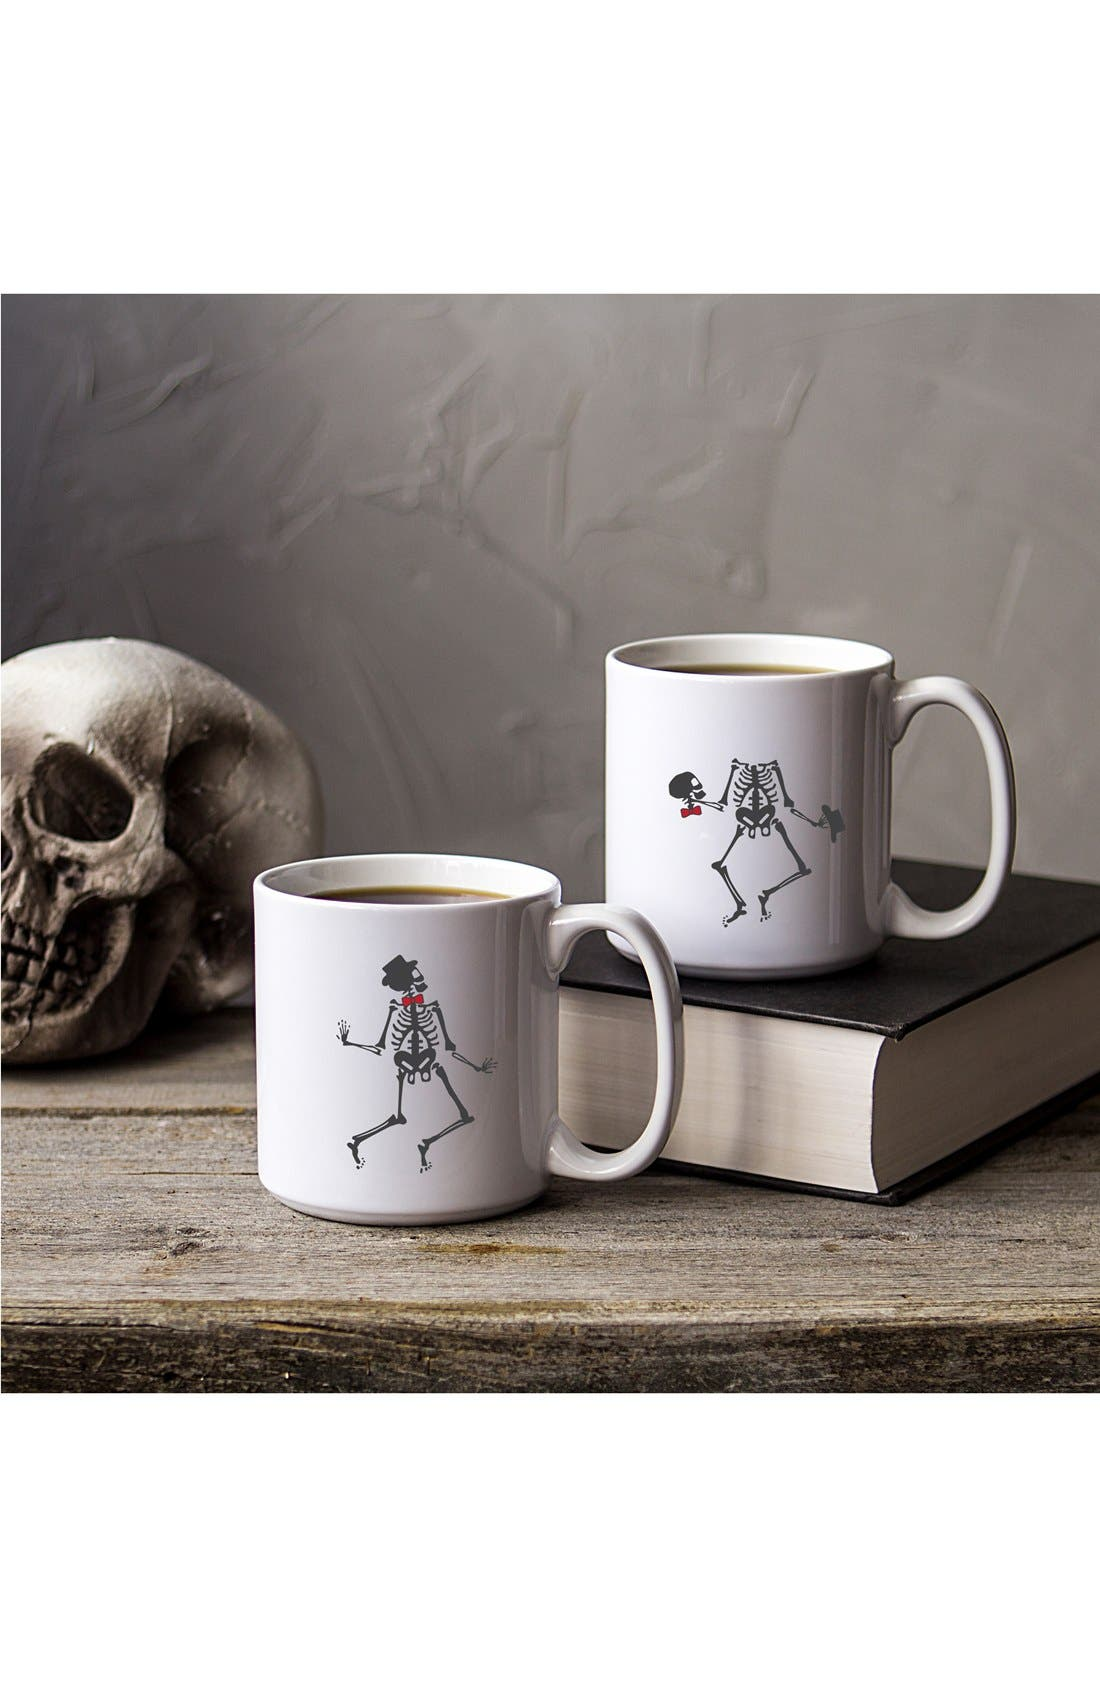 cathyu0027s concepts ceramic coffee mugs